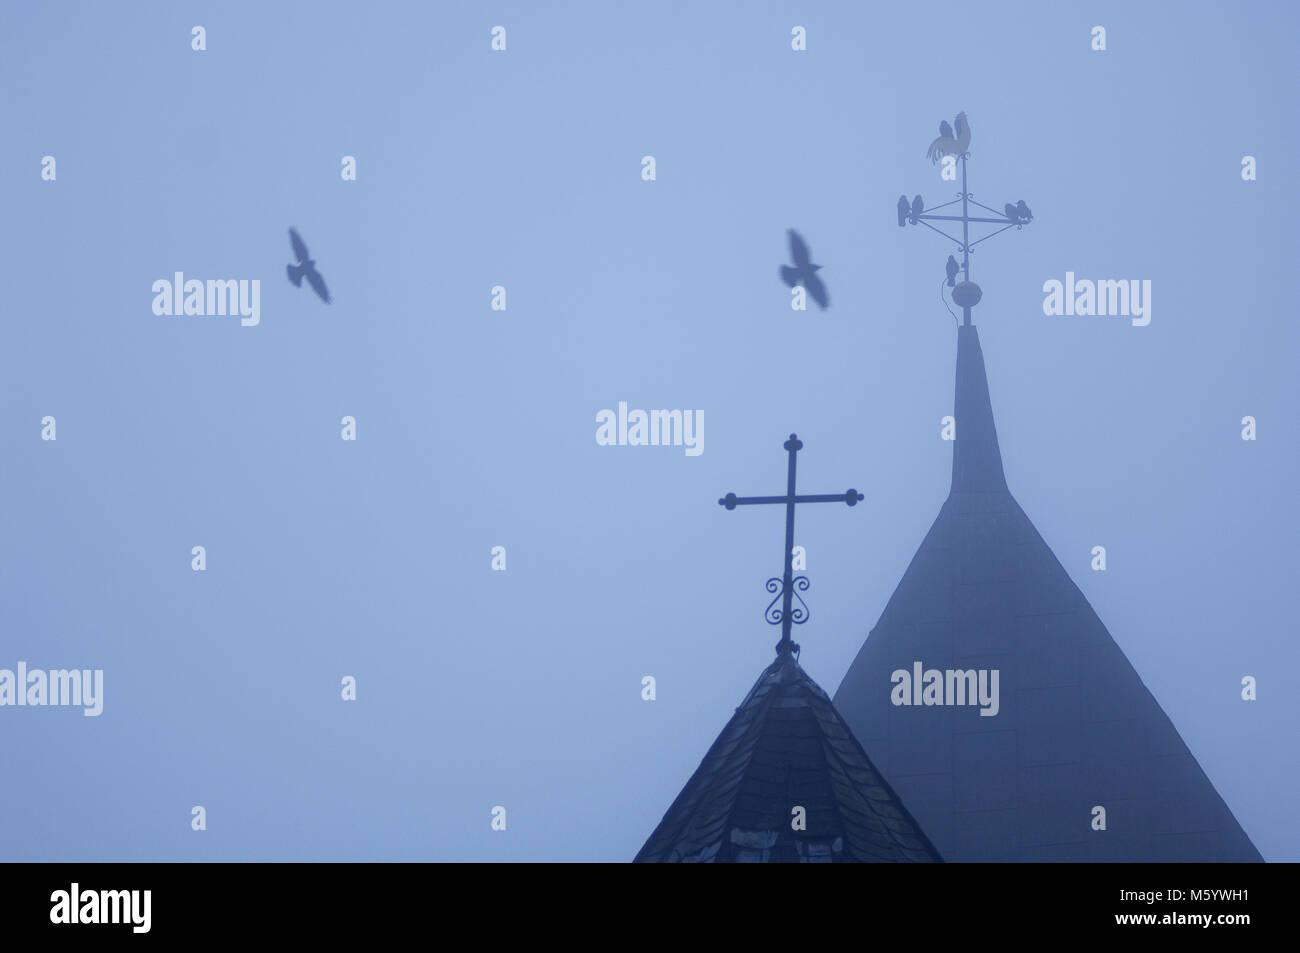 Kirchturm im Nebel - Stock Image